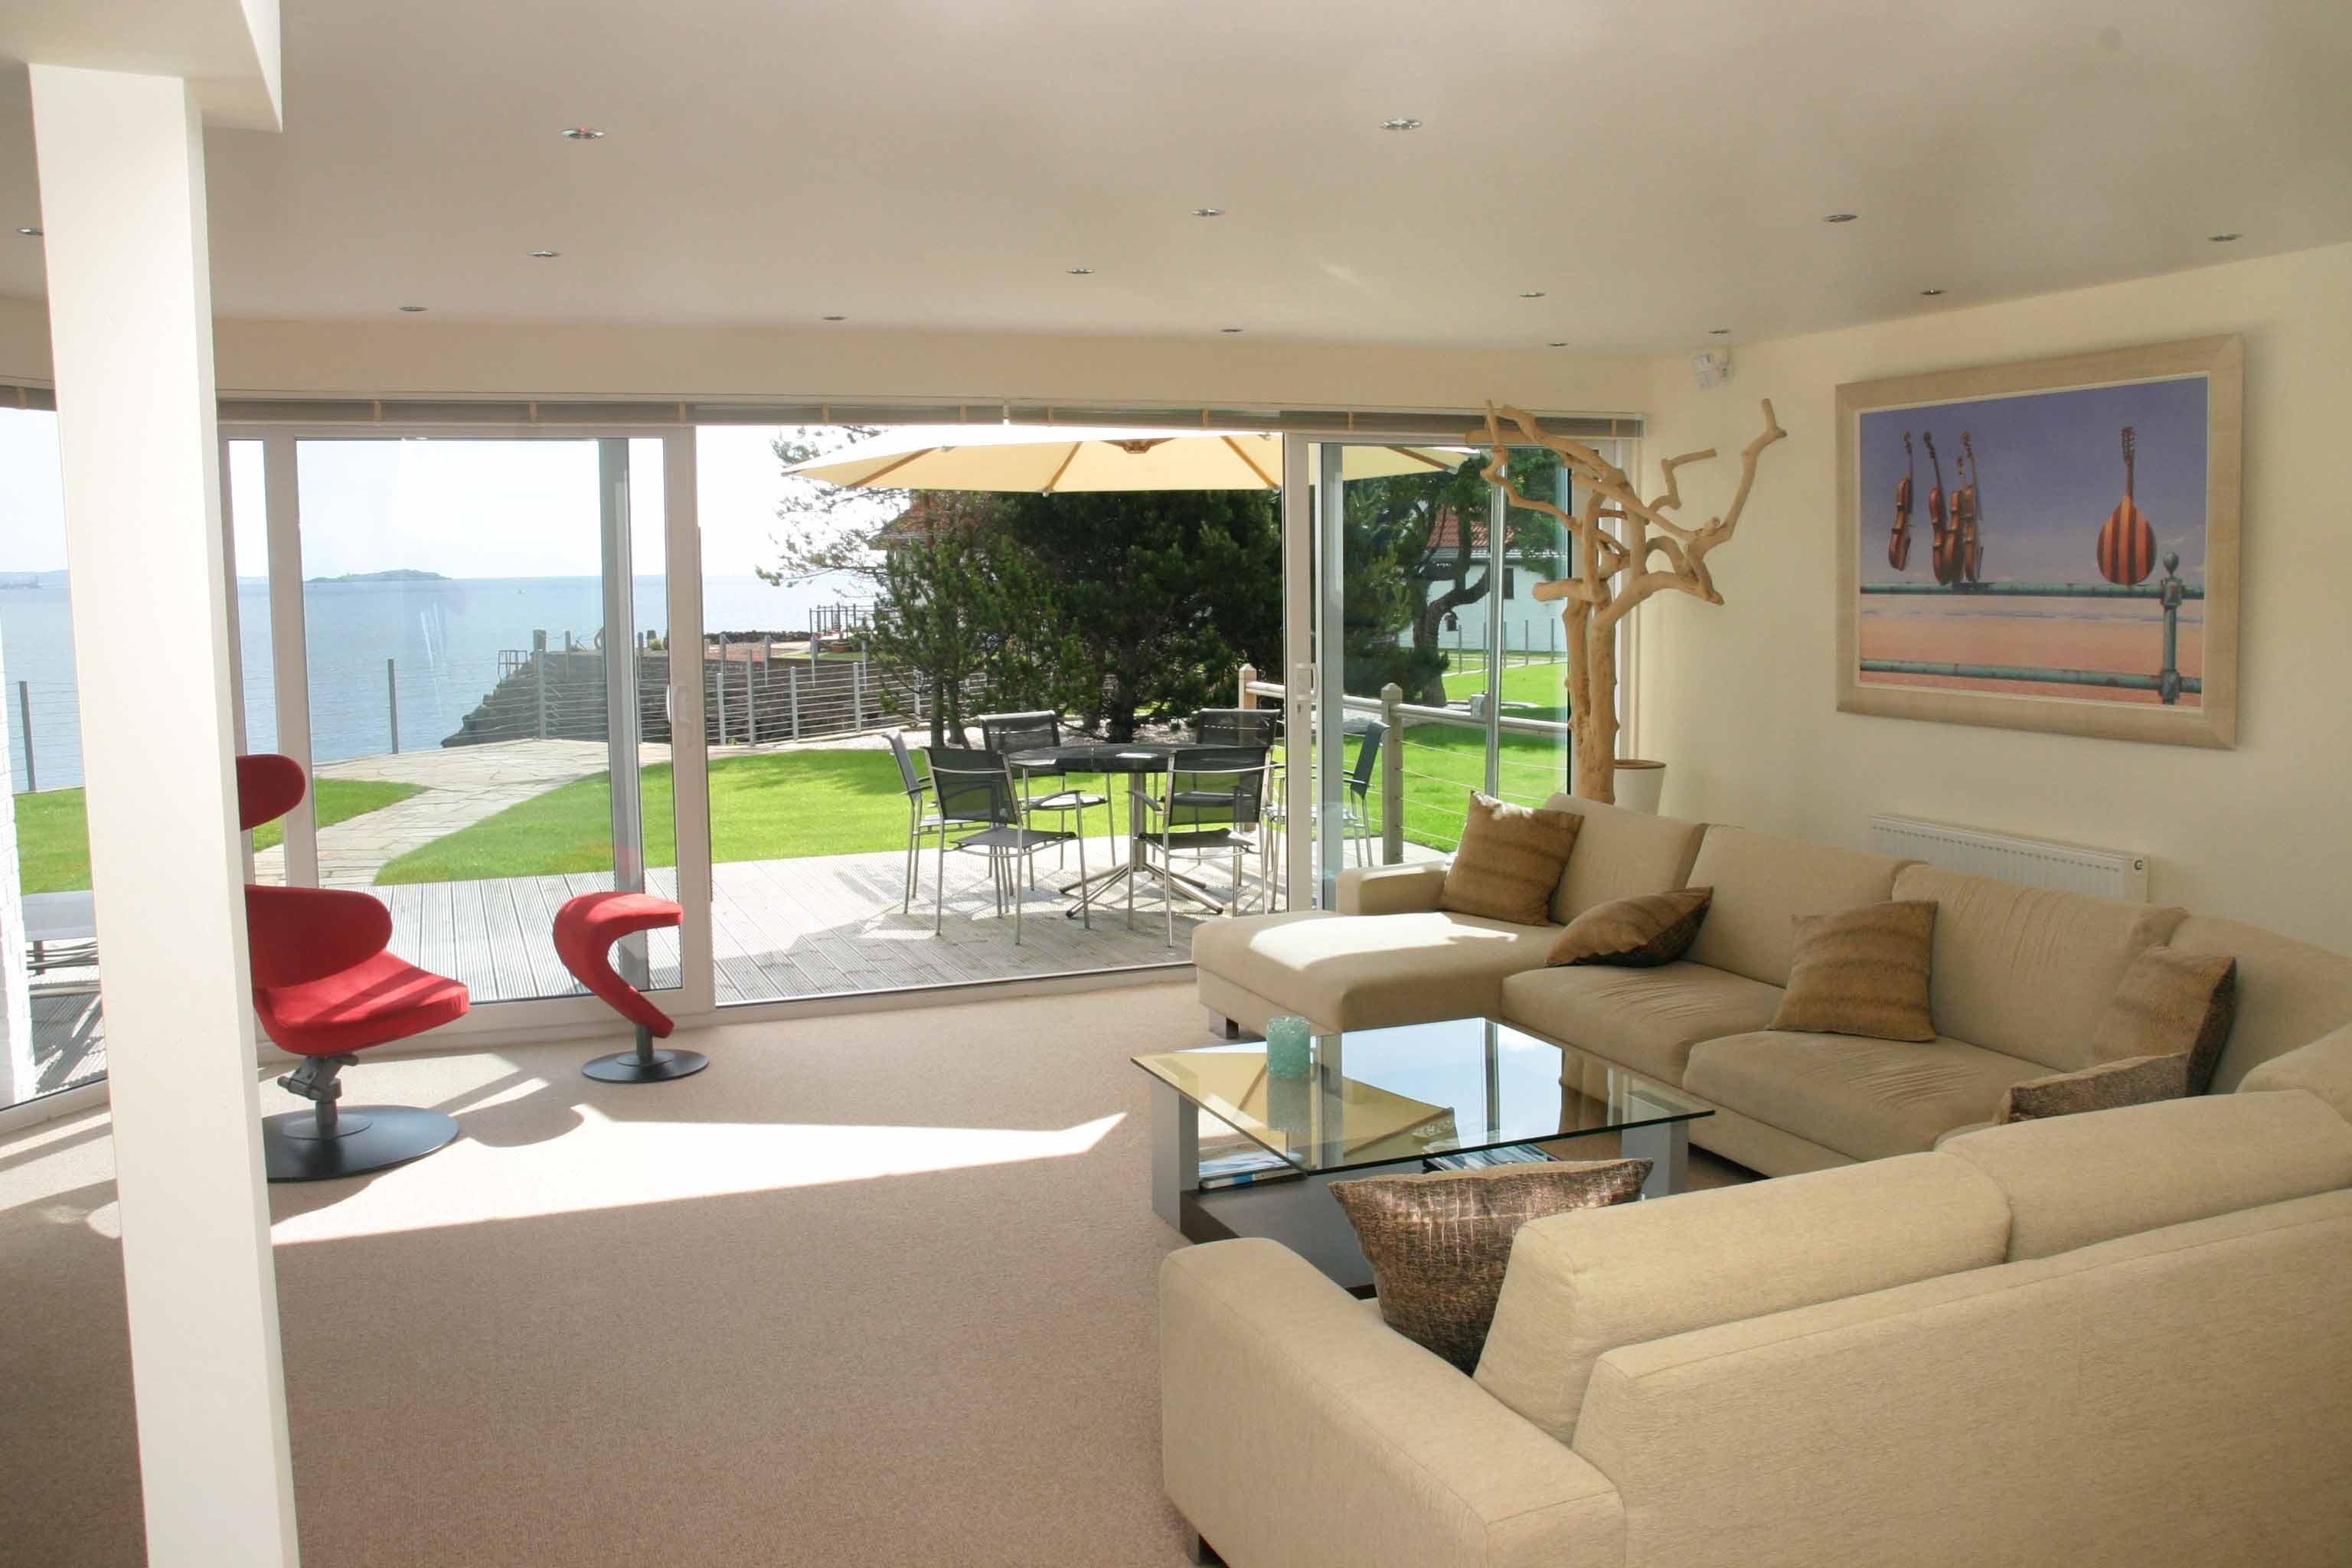 Double Glazing California, Falkirk